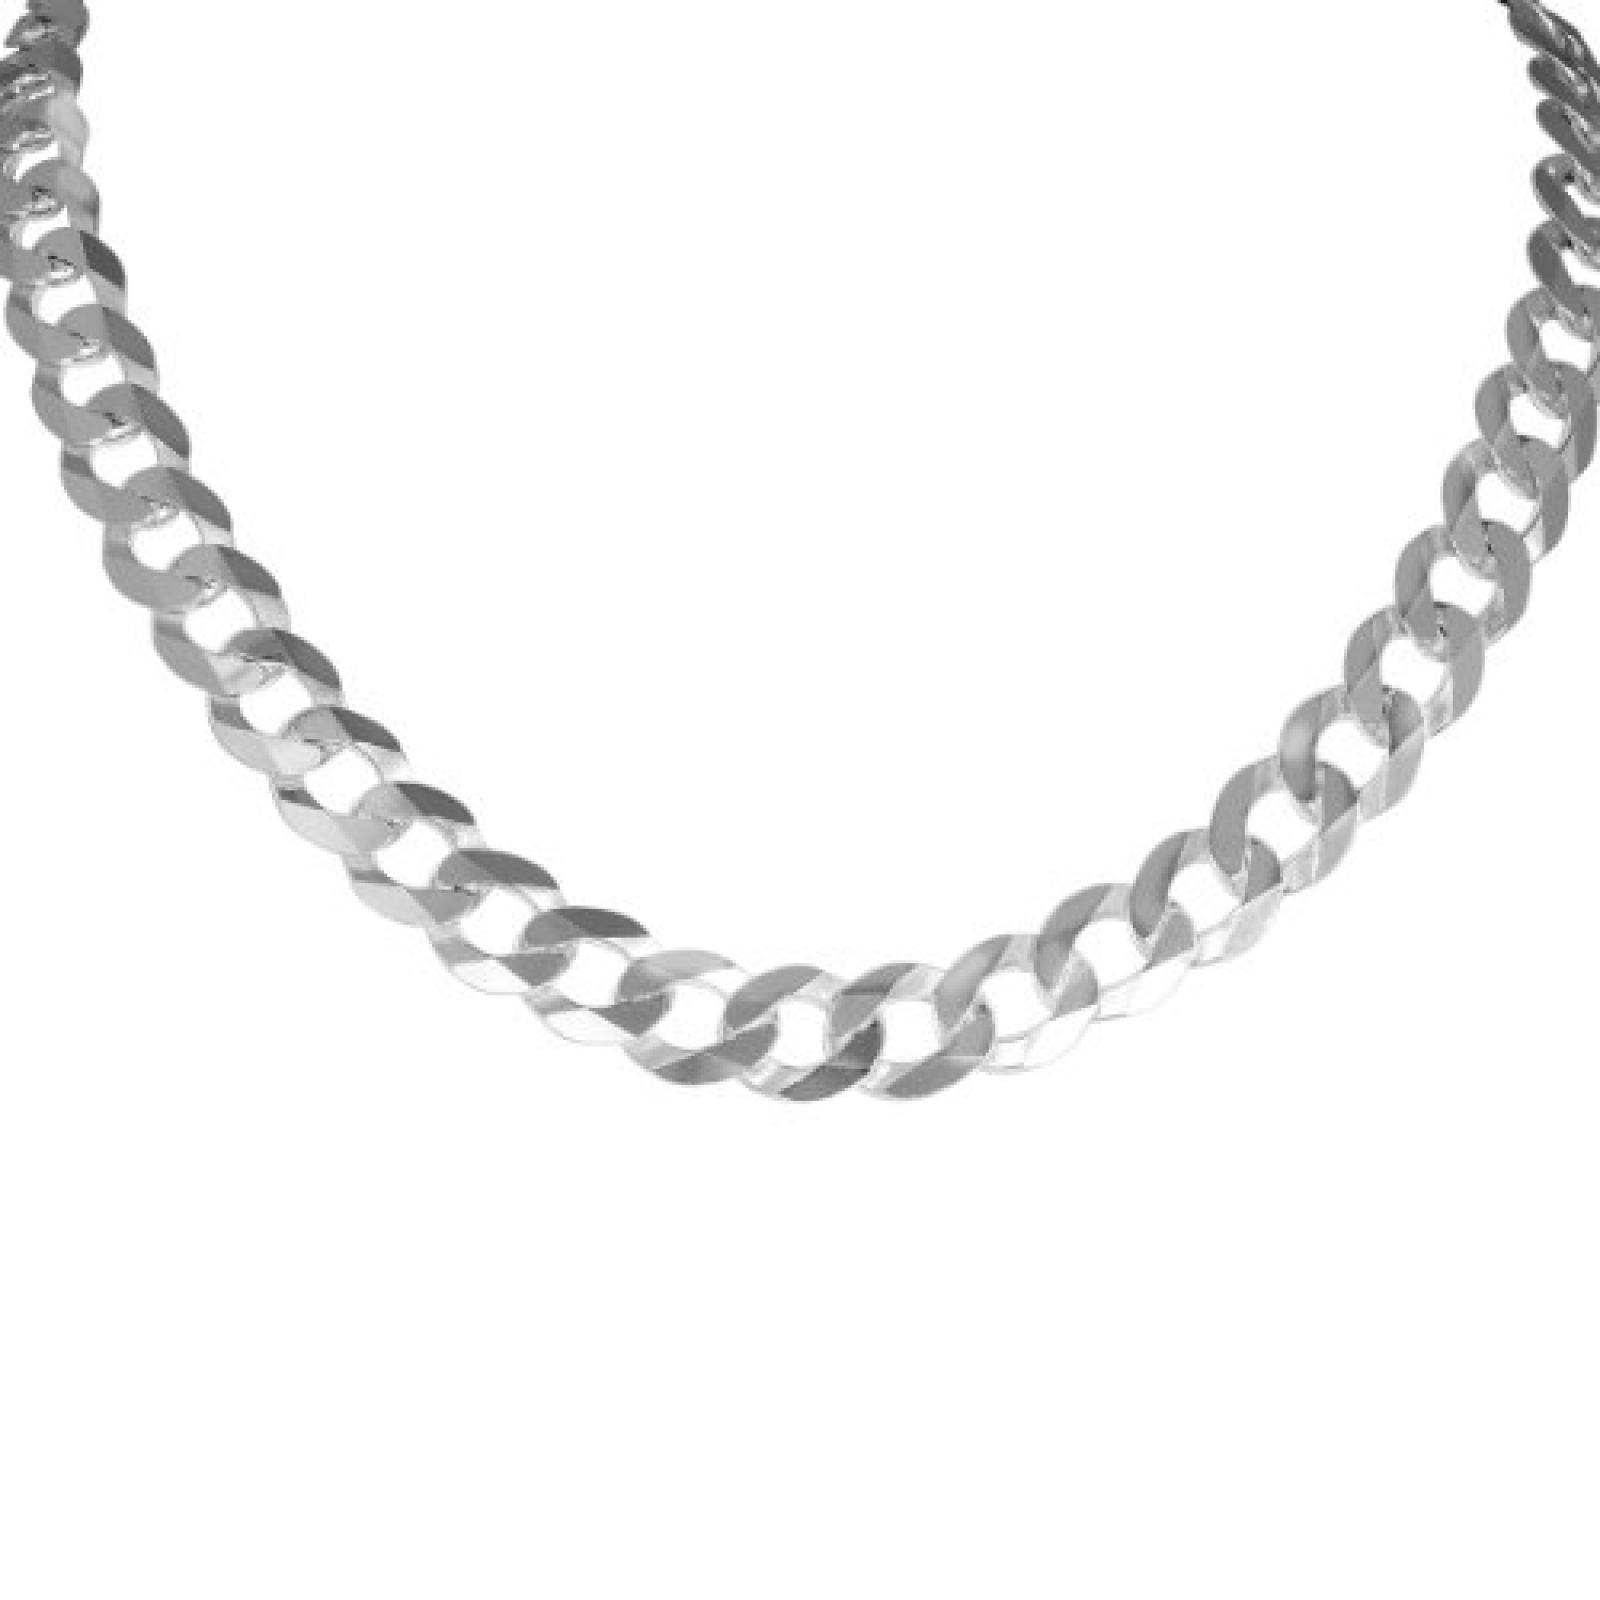 Bella Donna Herren Halskette 925 Sterling Silber 50.0 cm 76385009